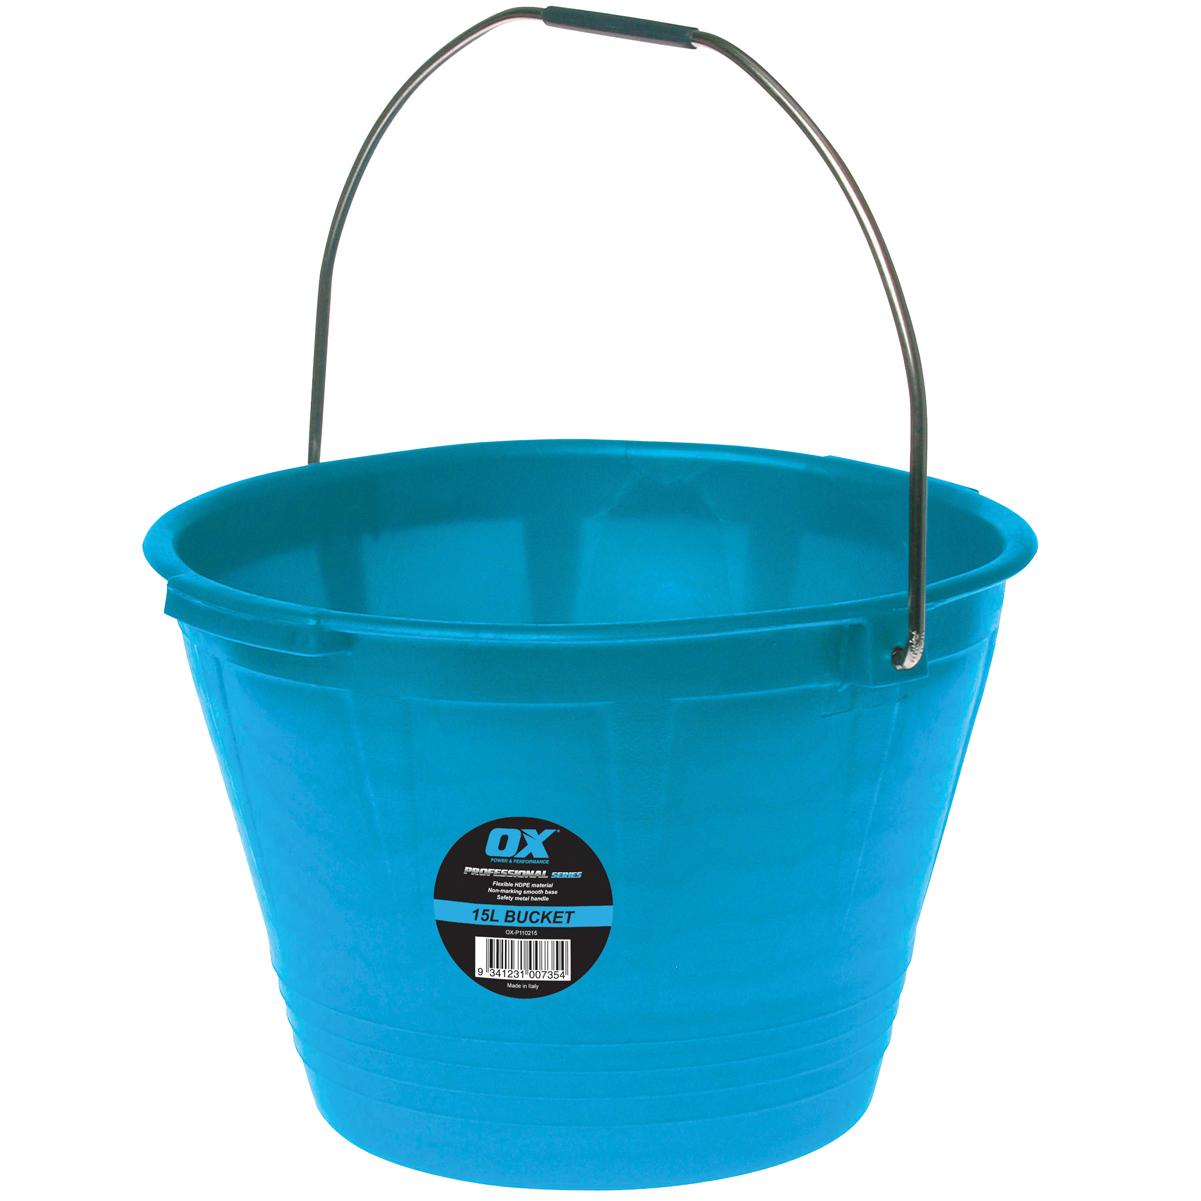 OX Prof 15L Masonry Bucket